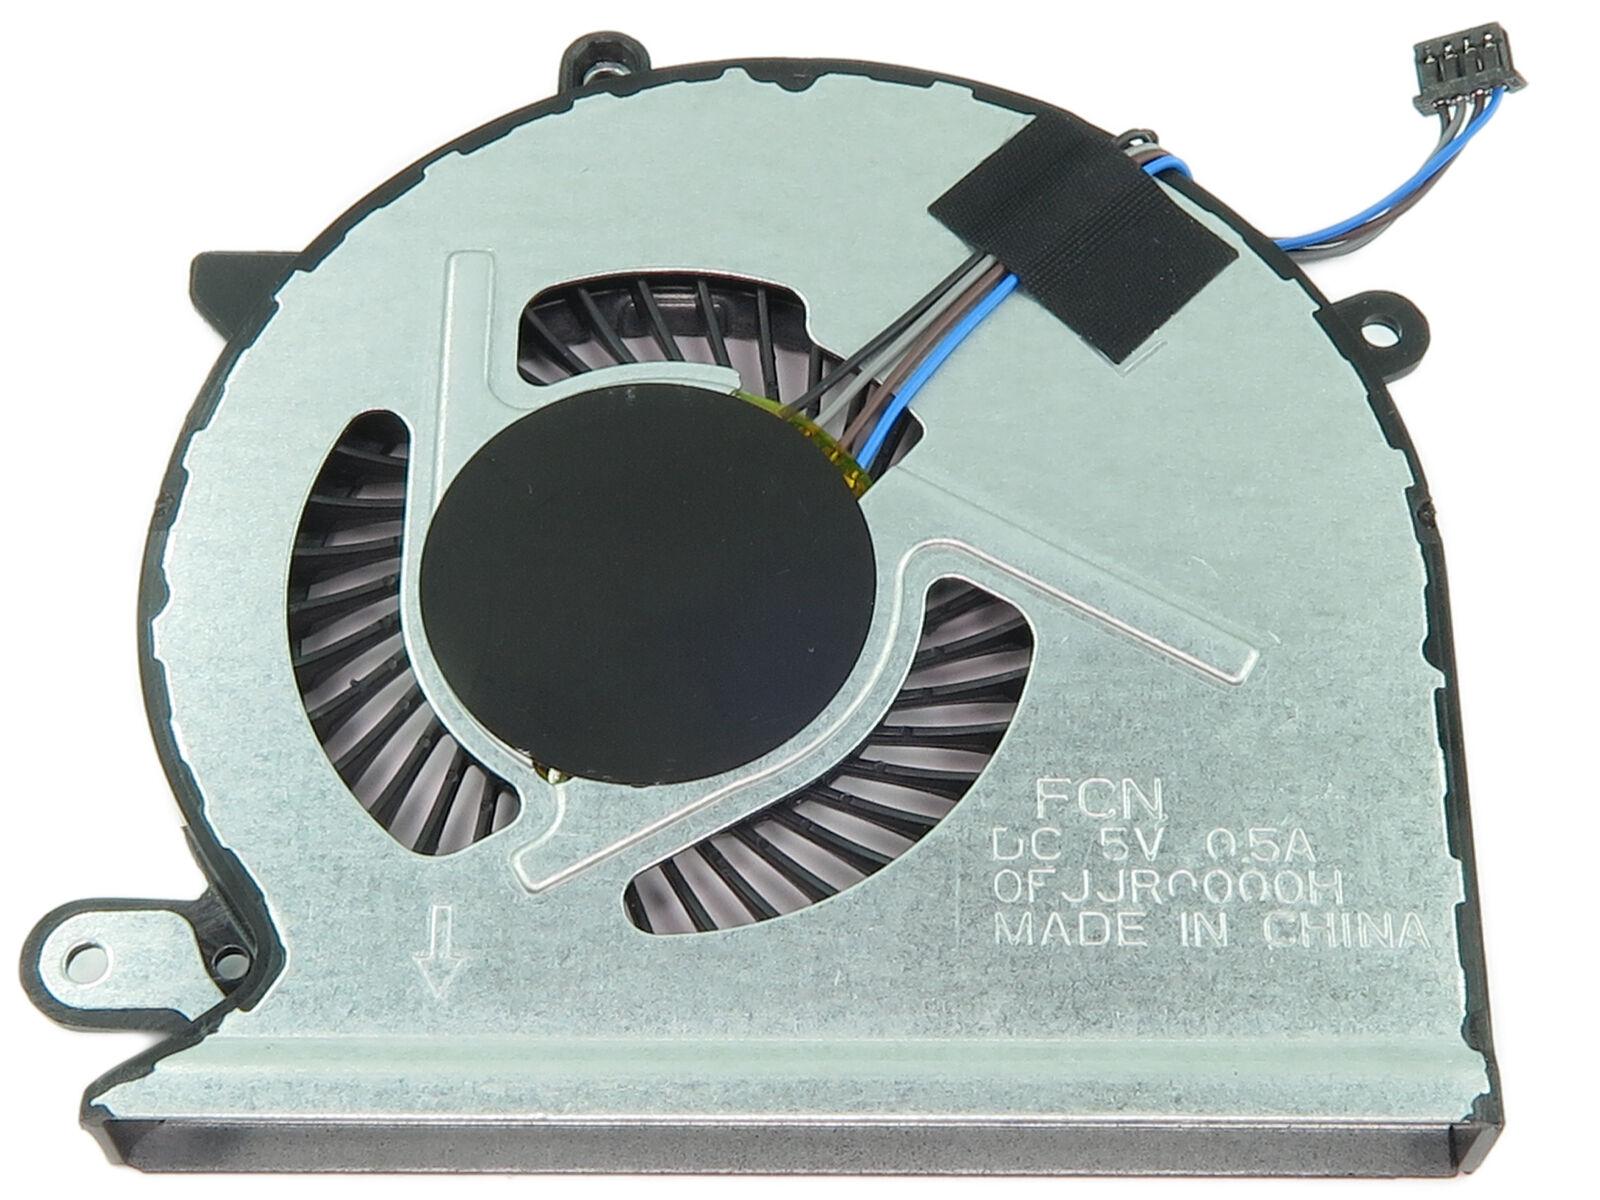 FixTek Laptop CPU Cooling Fan Cooler for HP Pavilion x360 13-s120nr